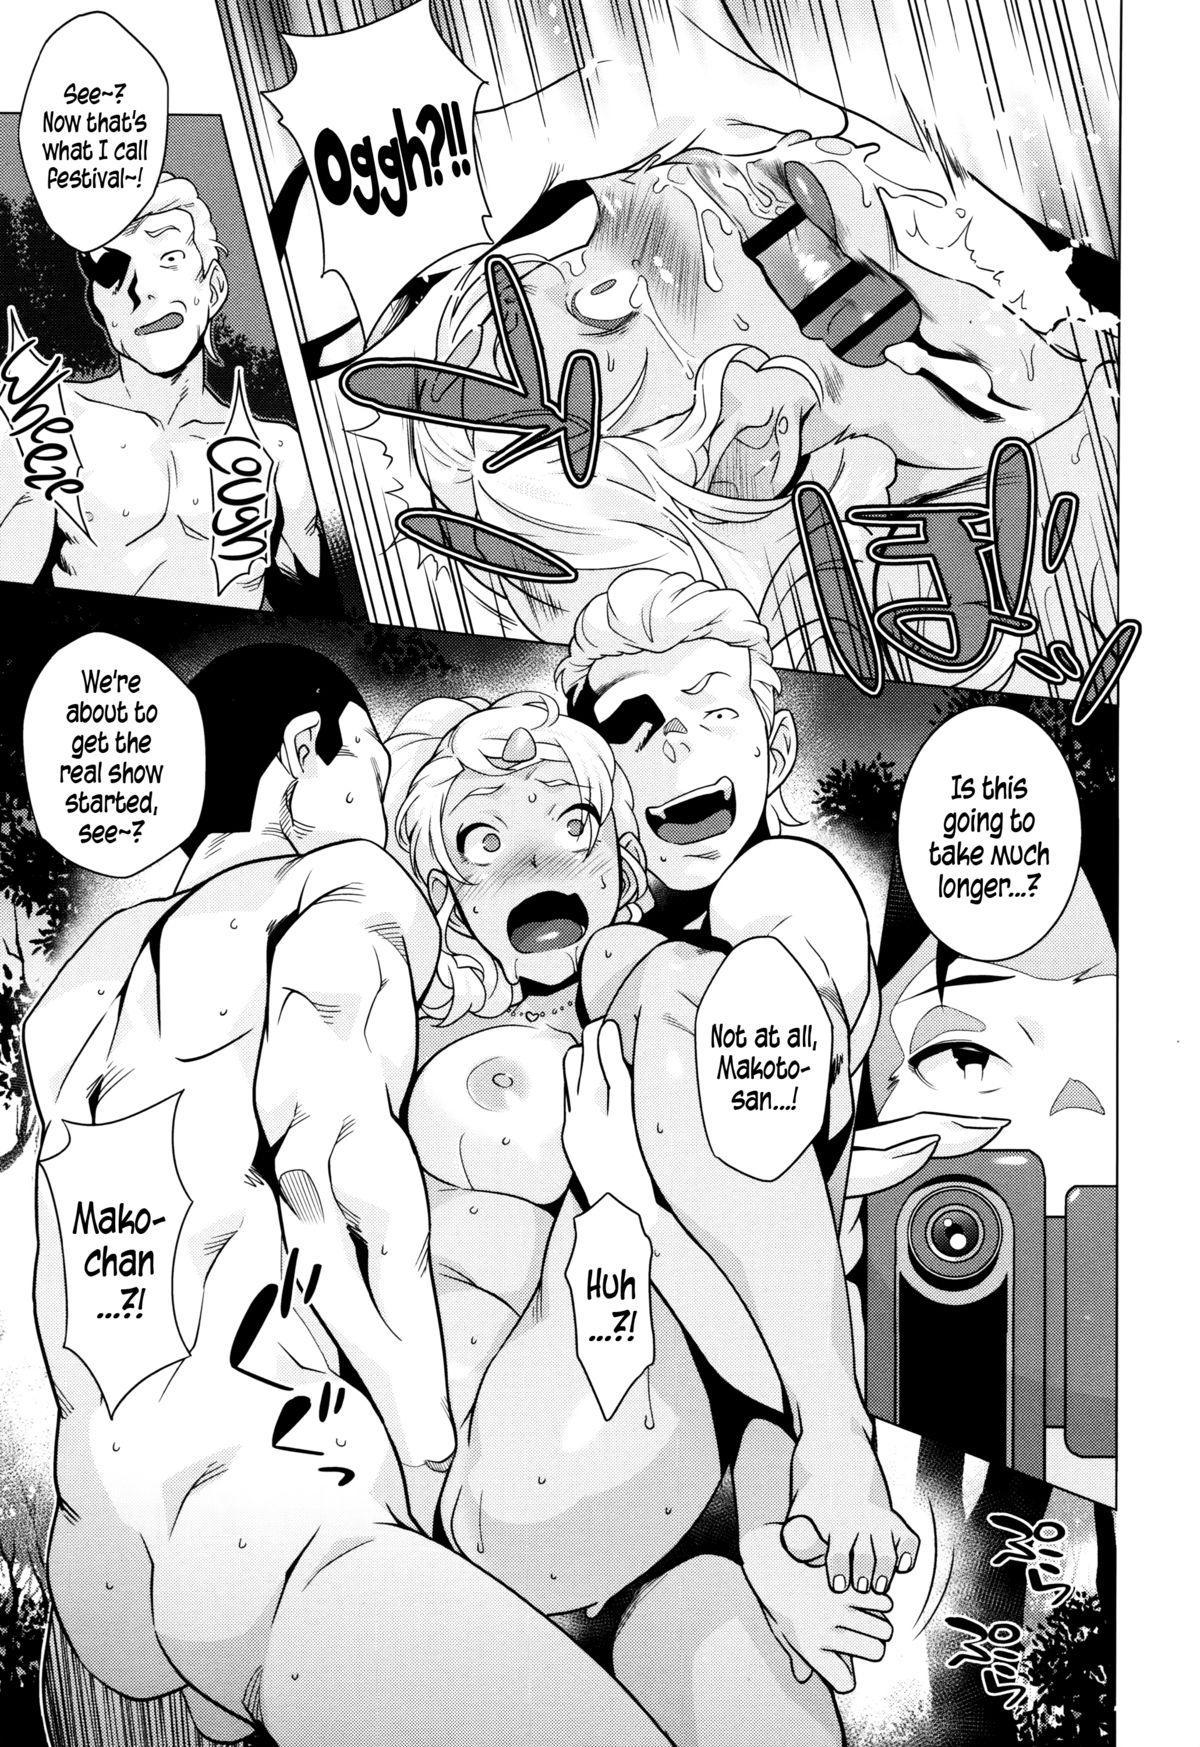 Hatsujou! Namaiki JK | Horny! Cheeky JK 39